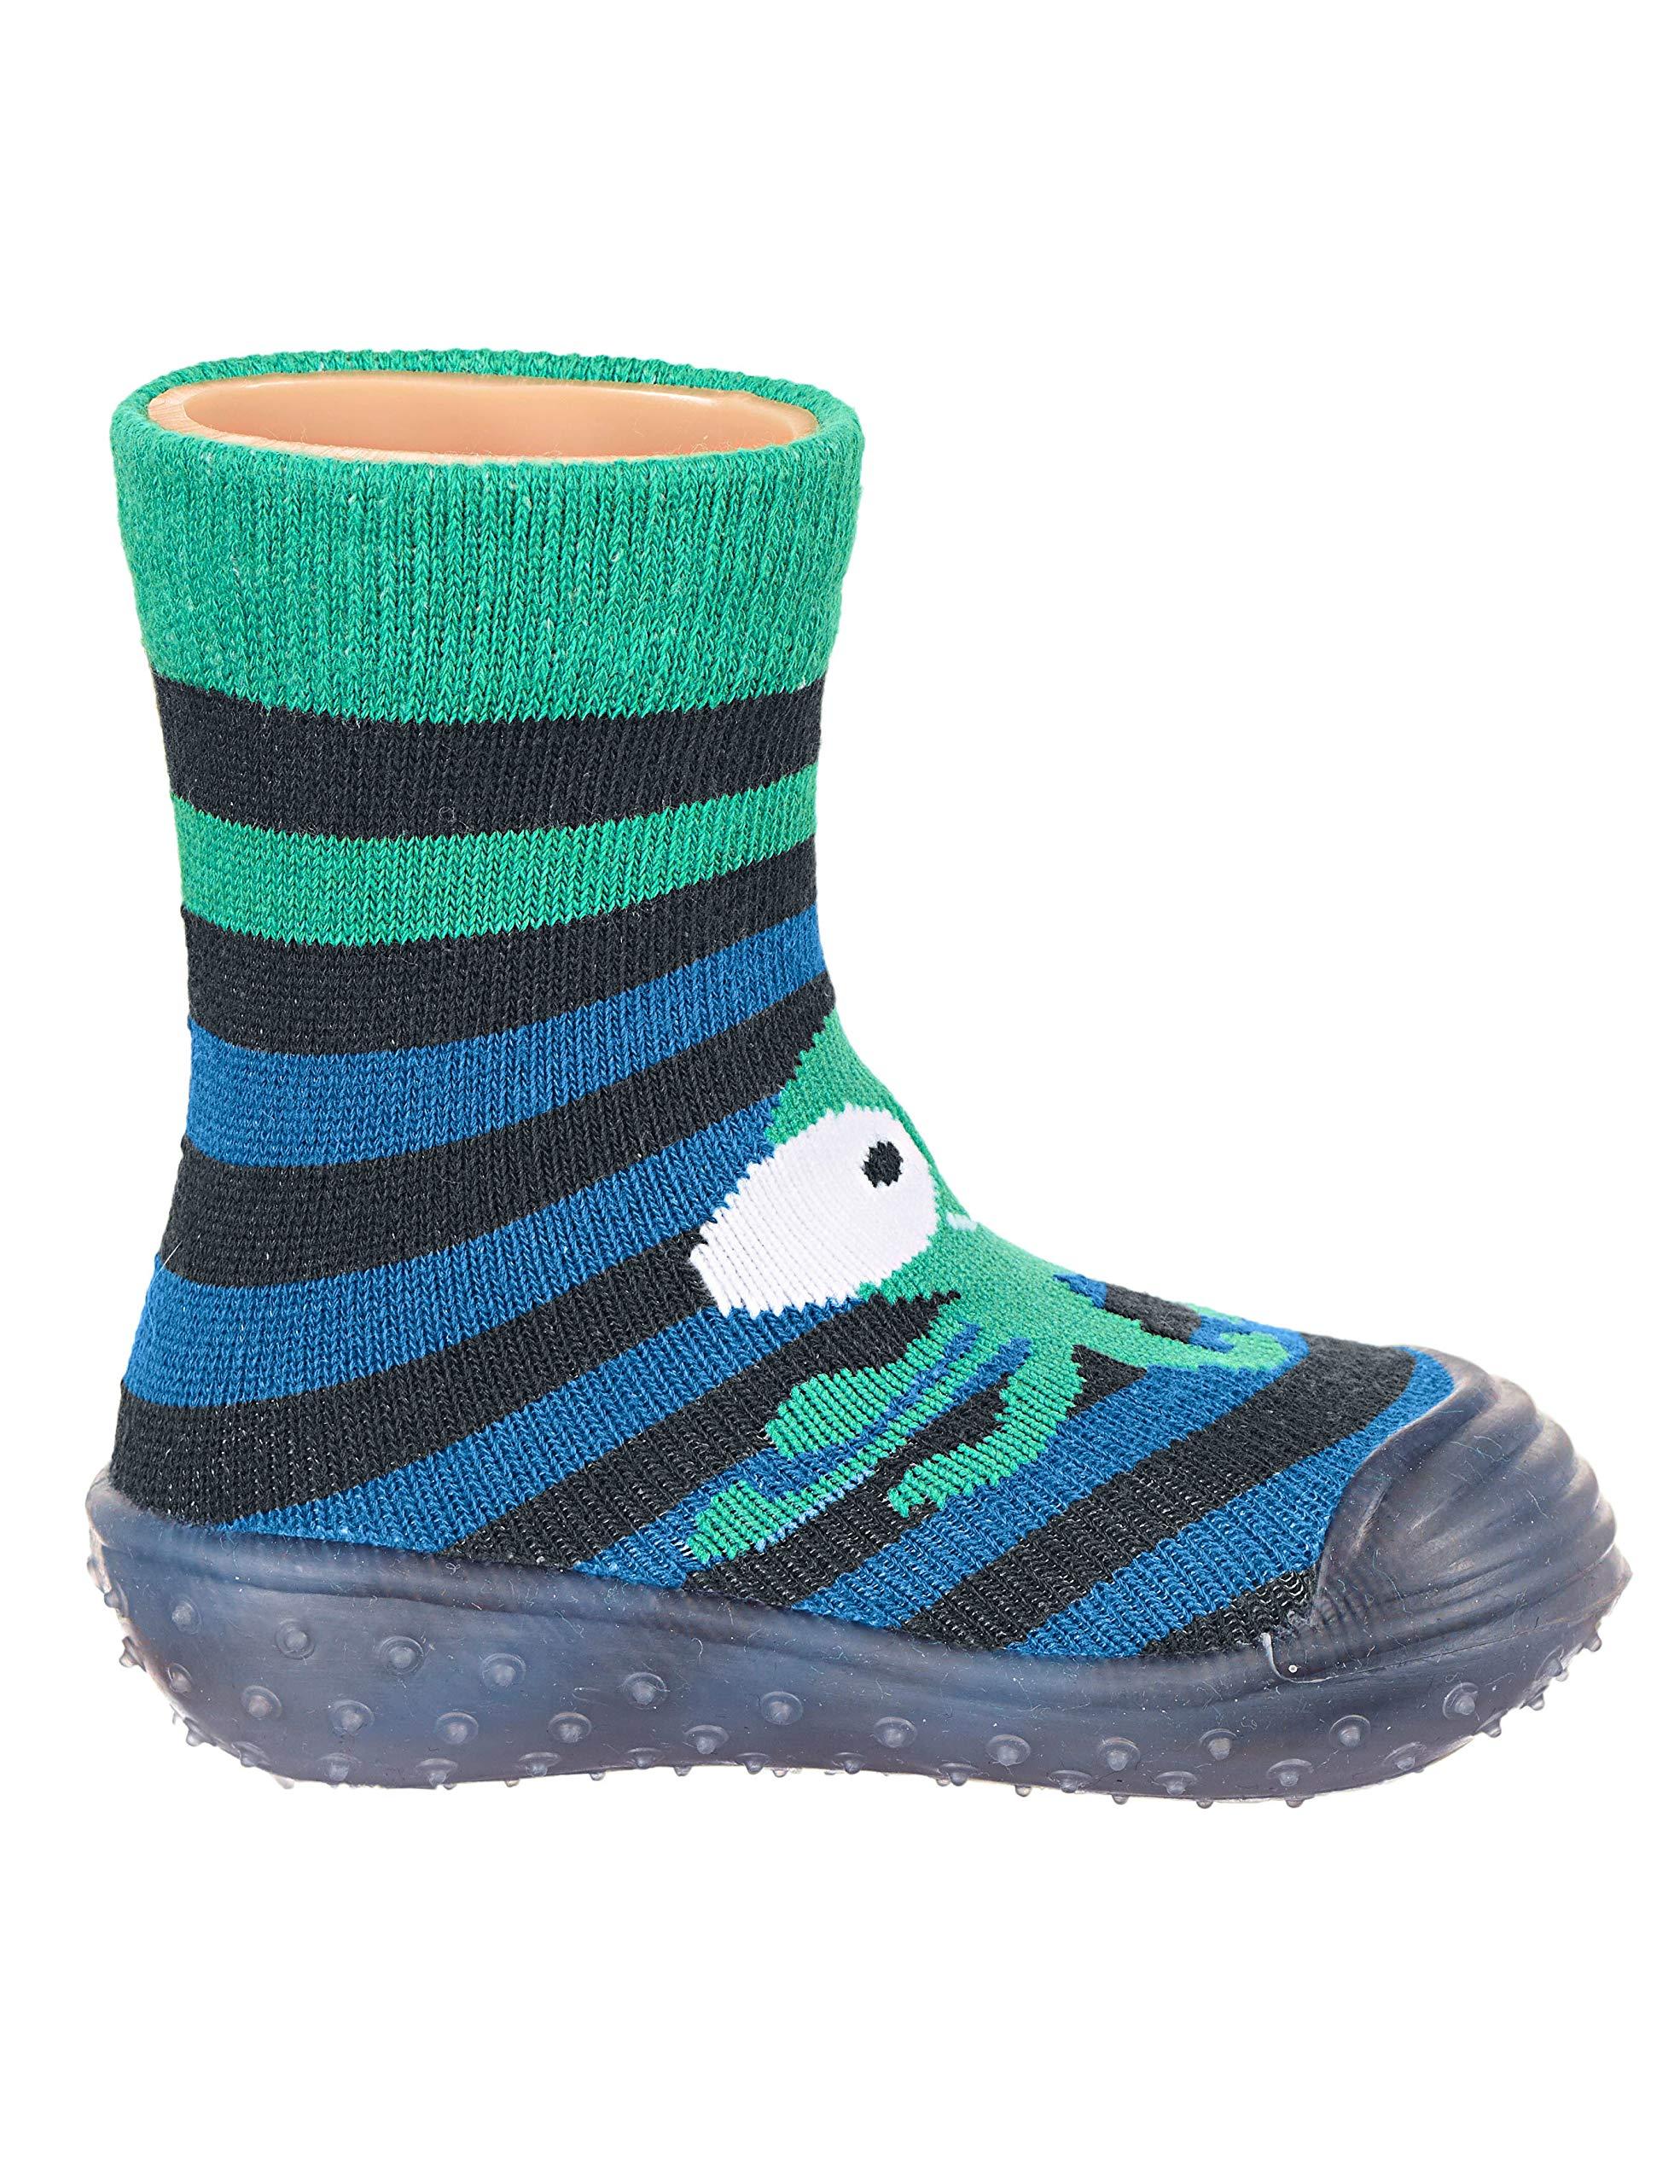 Sterntaler Adventure-Socks Qualle, Zapatillas Impermeables para Niños 3